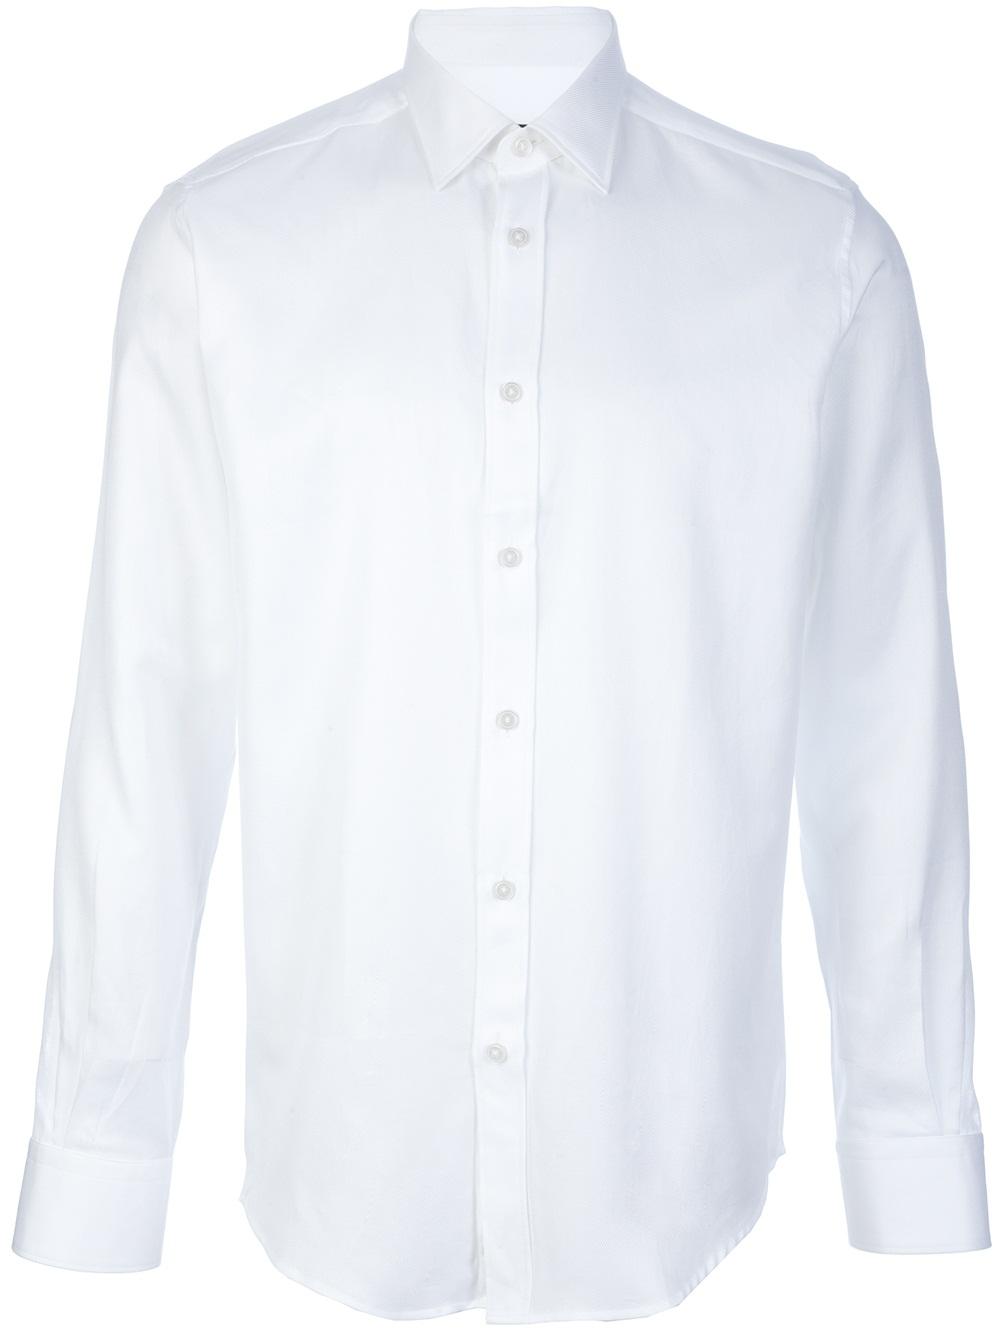 Z zegna Plain Button Down Shirt in White for Men | Lyst